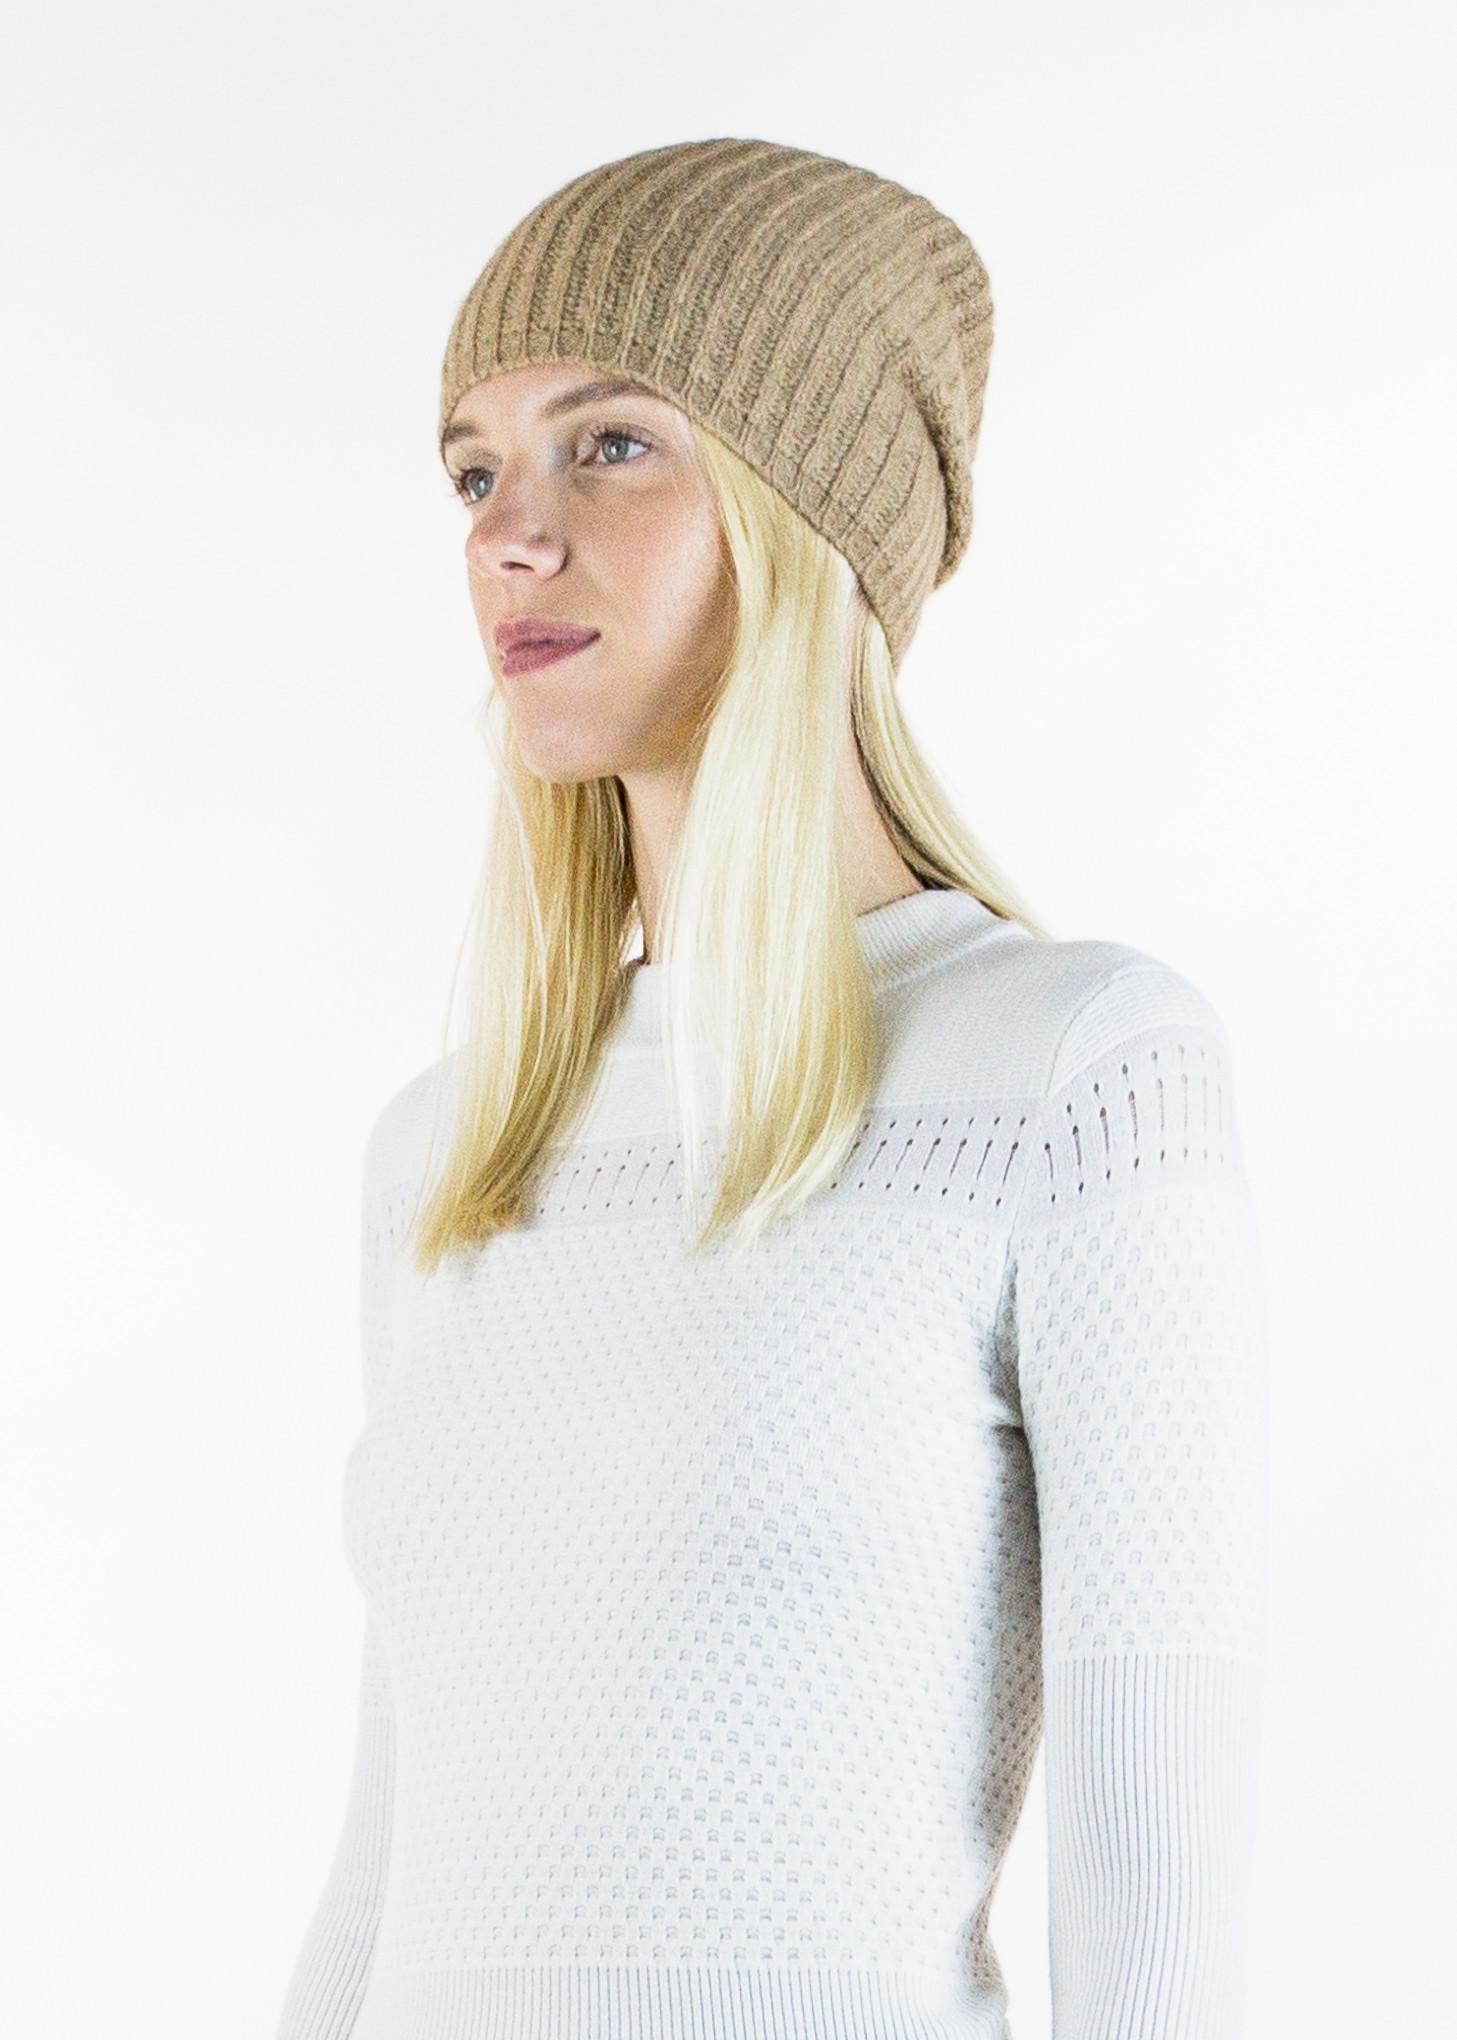 Maison Kitsune winter fashion